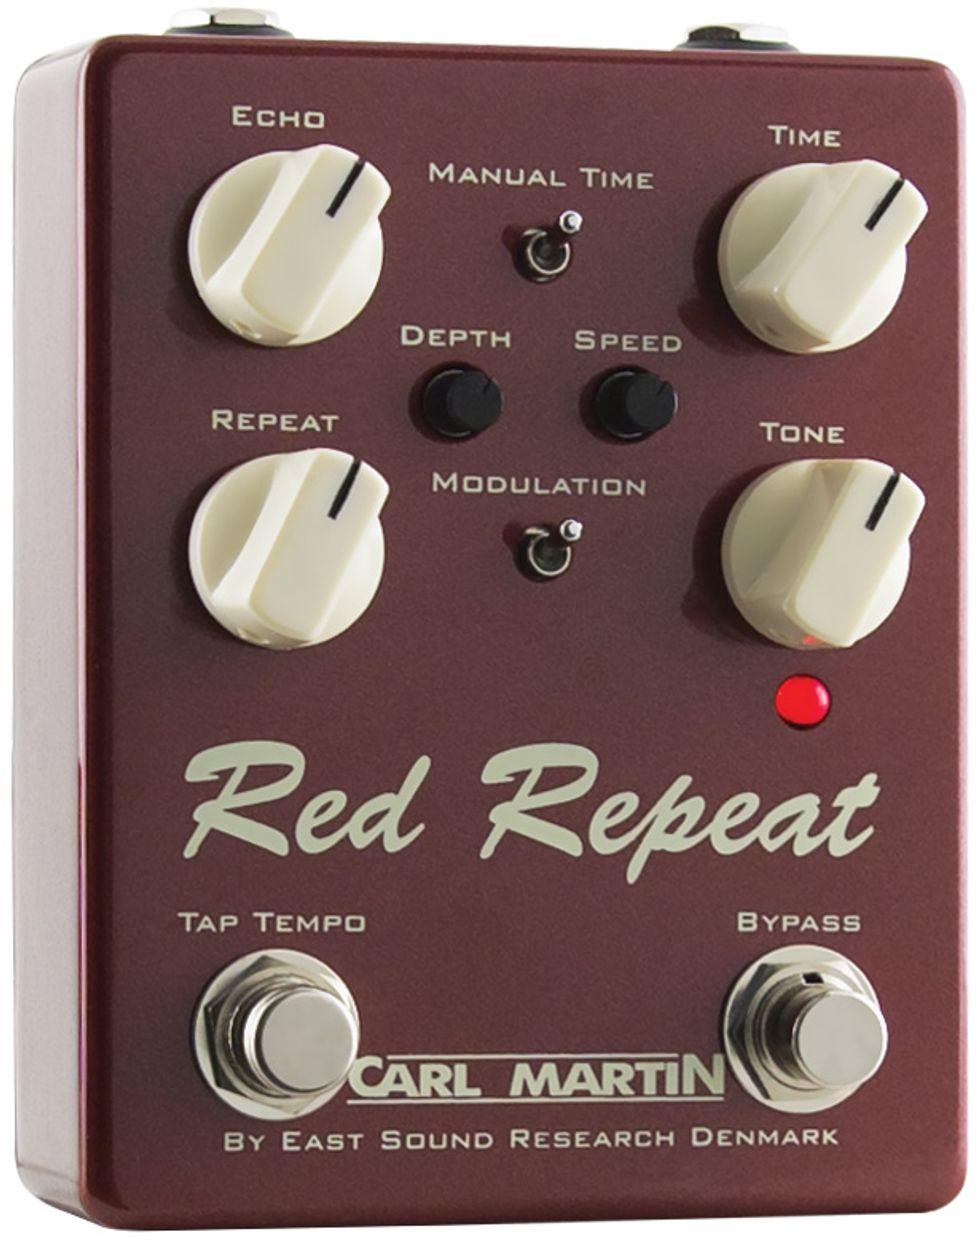 Oct17-Carl Martin-FEAT